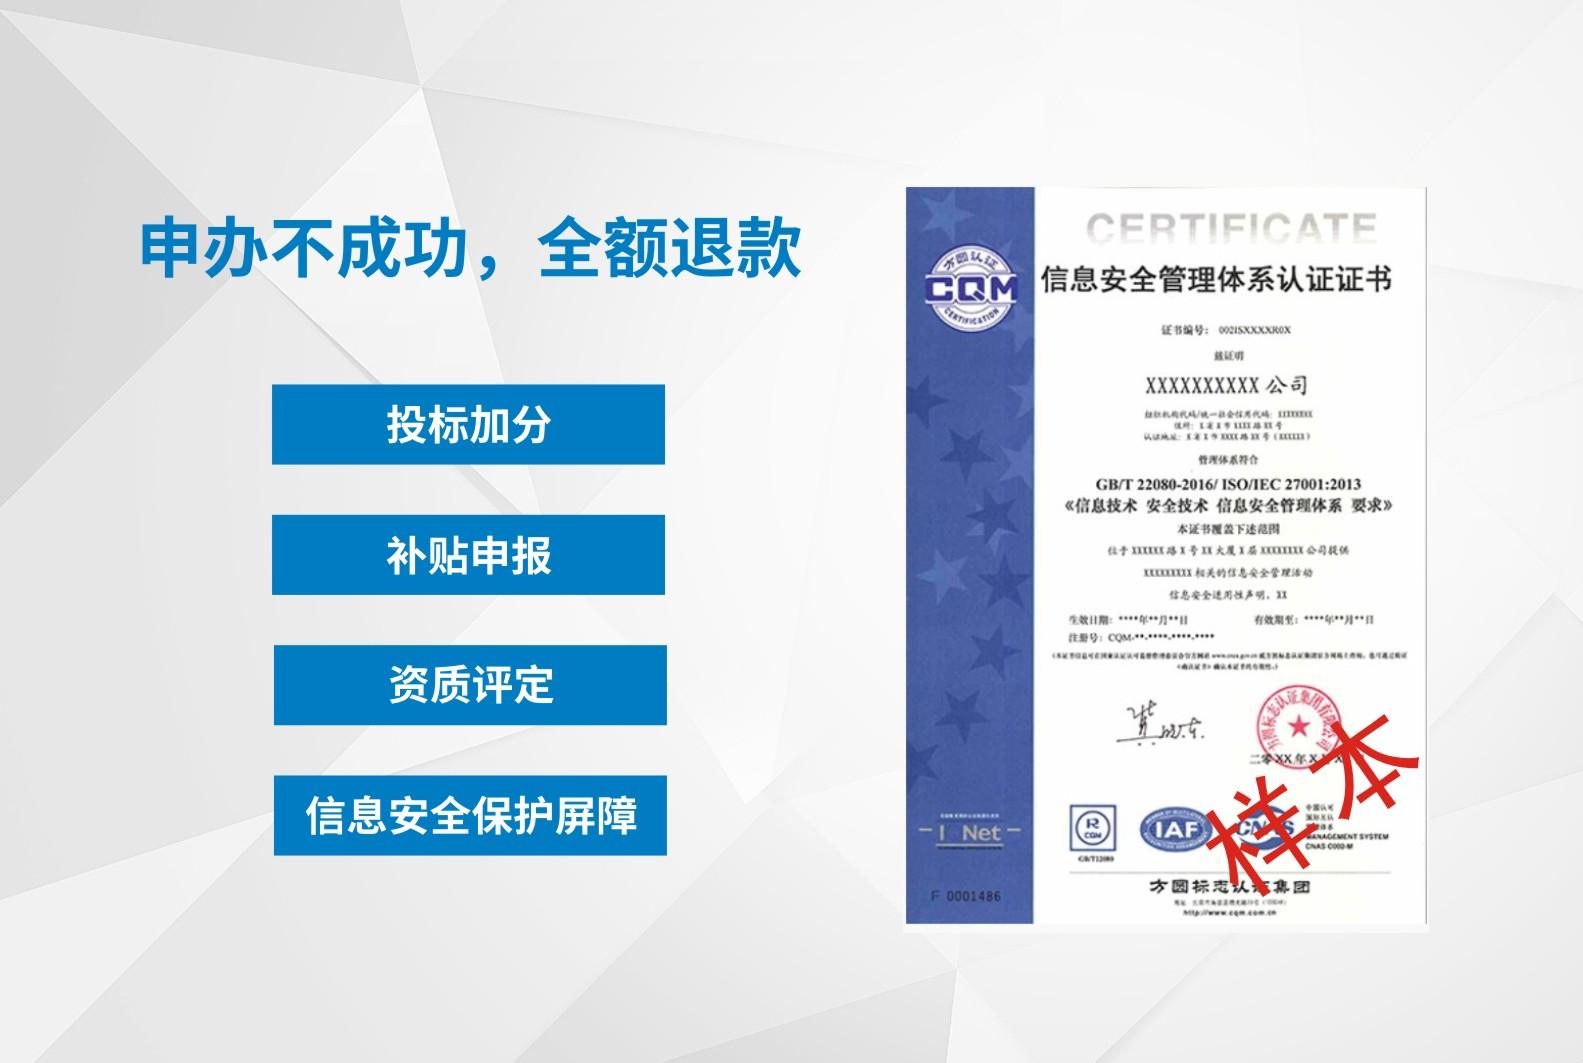 ISO27001-信息安全管理體系